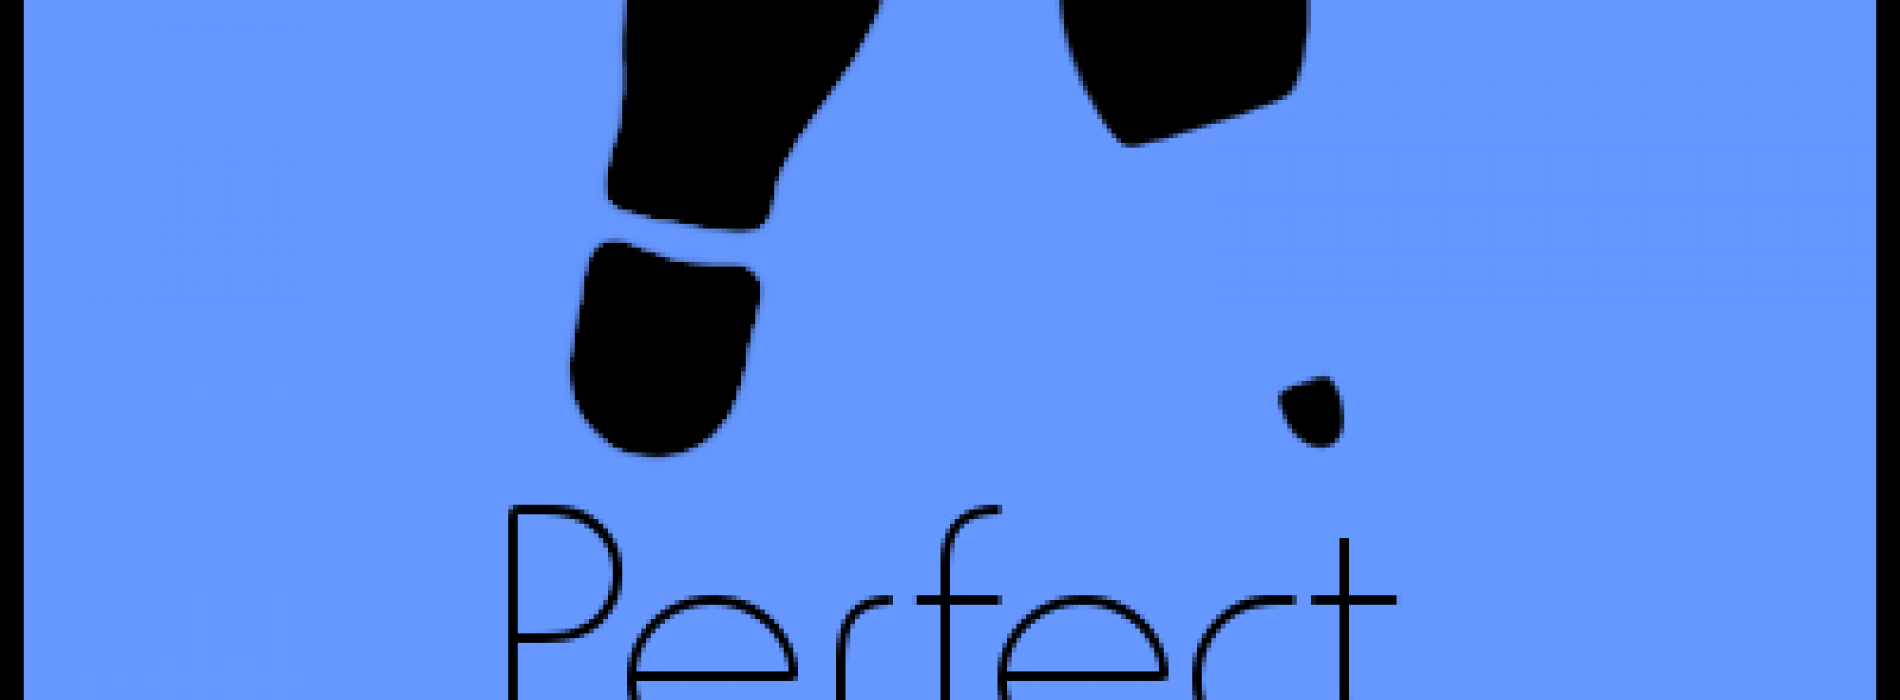 Huzni Ft Sash: Perfect